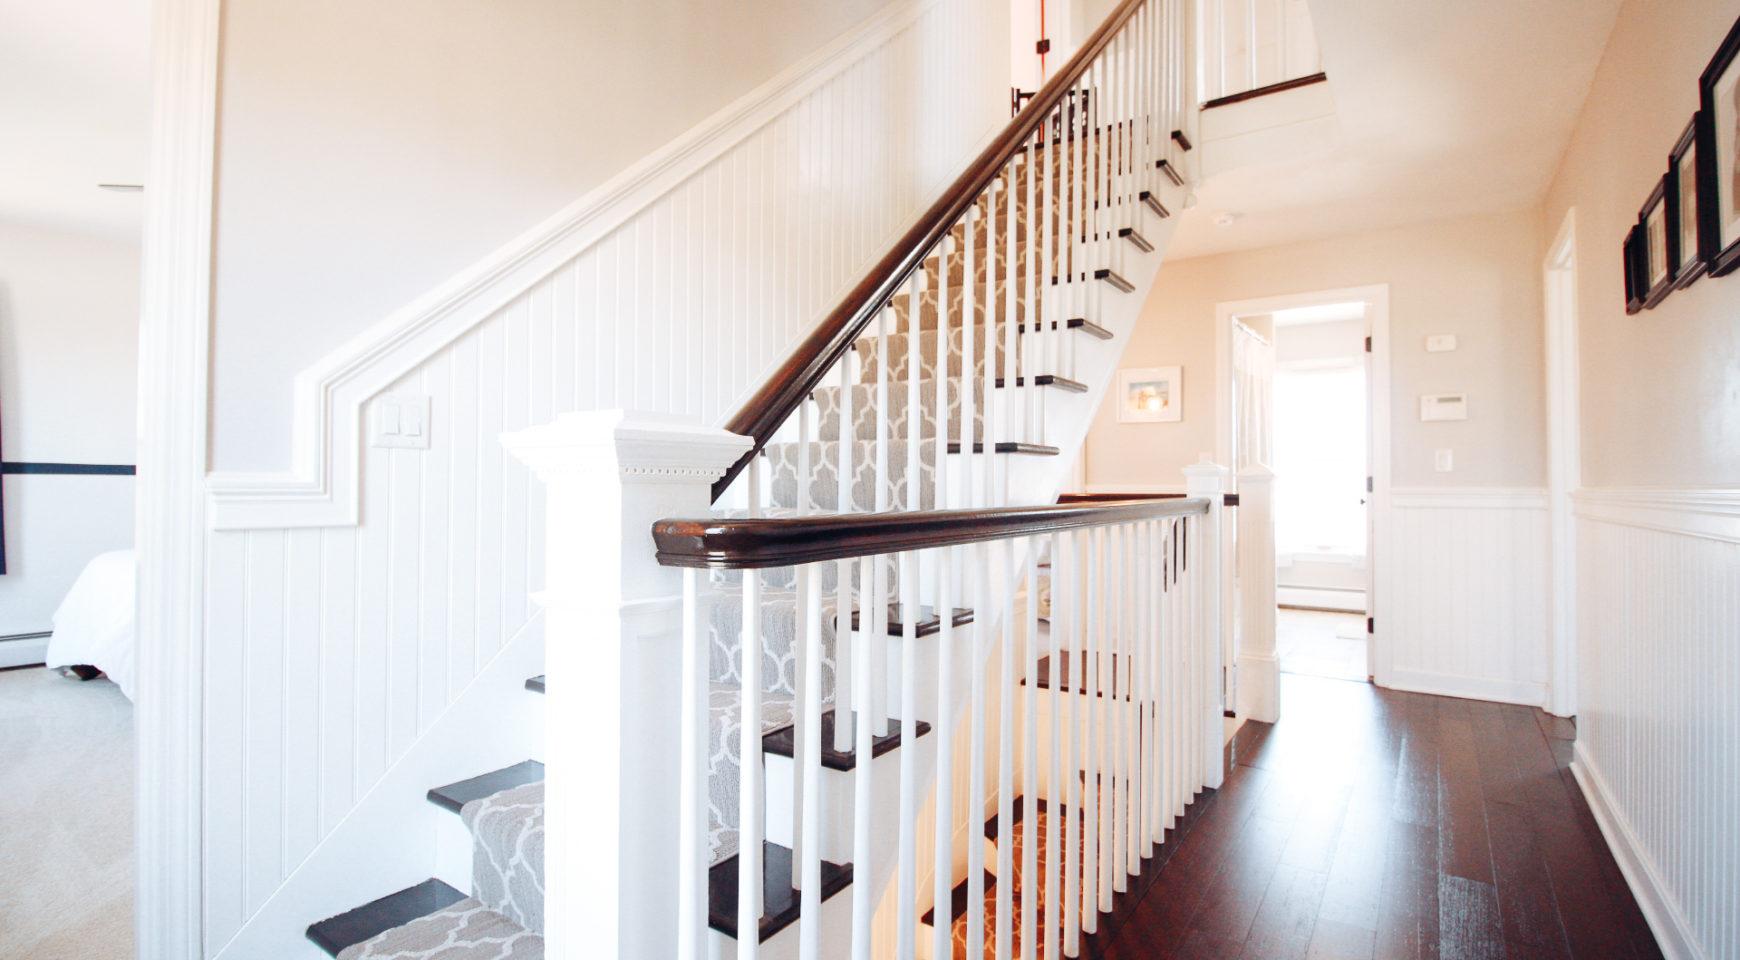 Luxe_and_Livable_Interior_Design_Blog_by_Maloney_Interiors_Newport_Rhode_Island_Fitzpatrick_Team_Remax_11.jpg